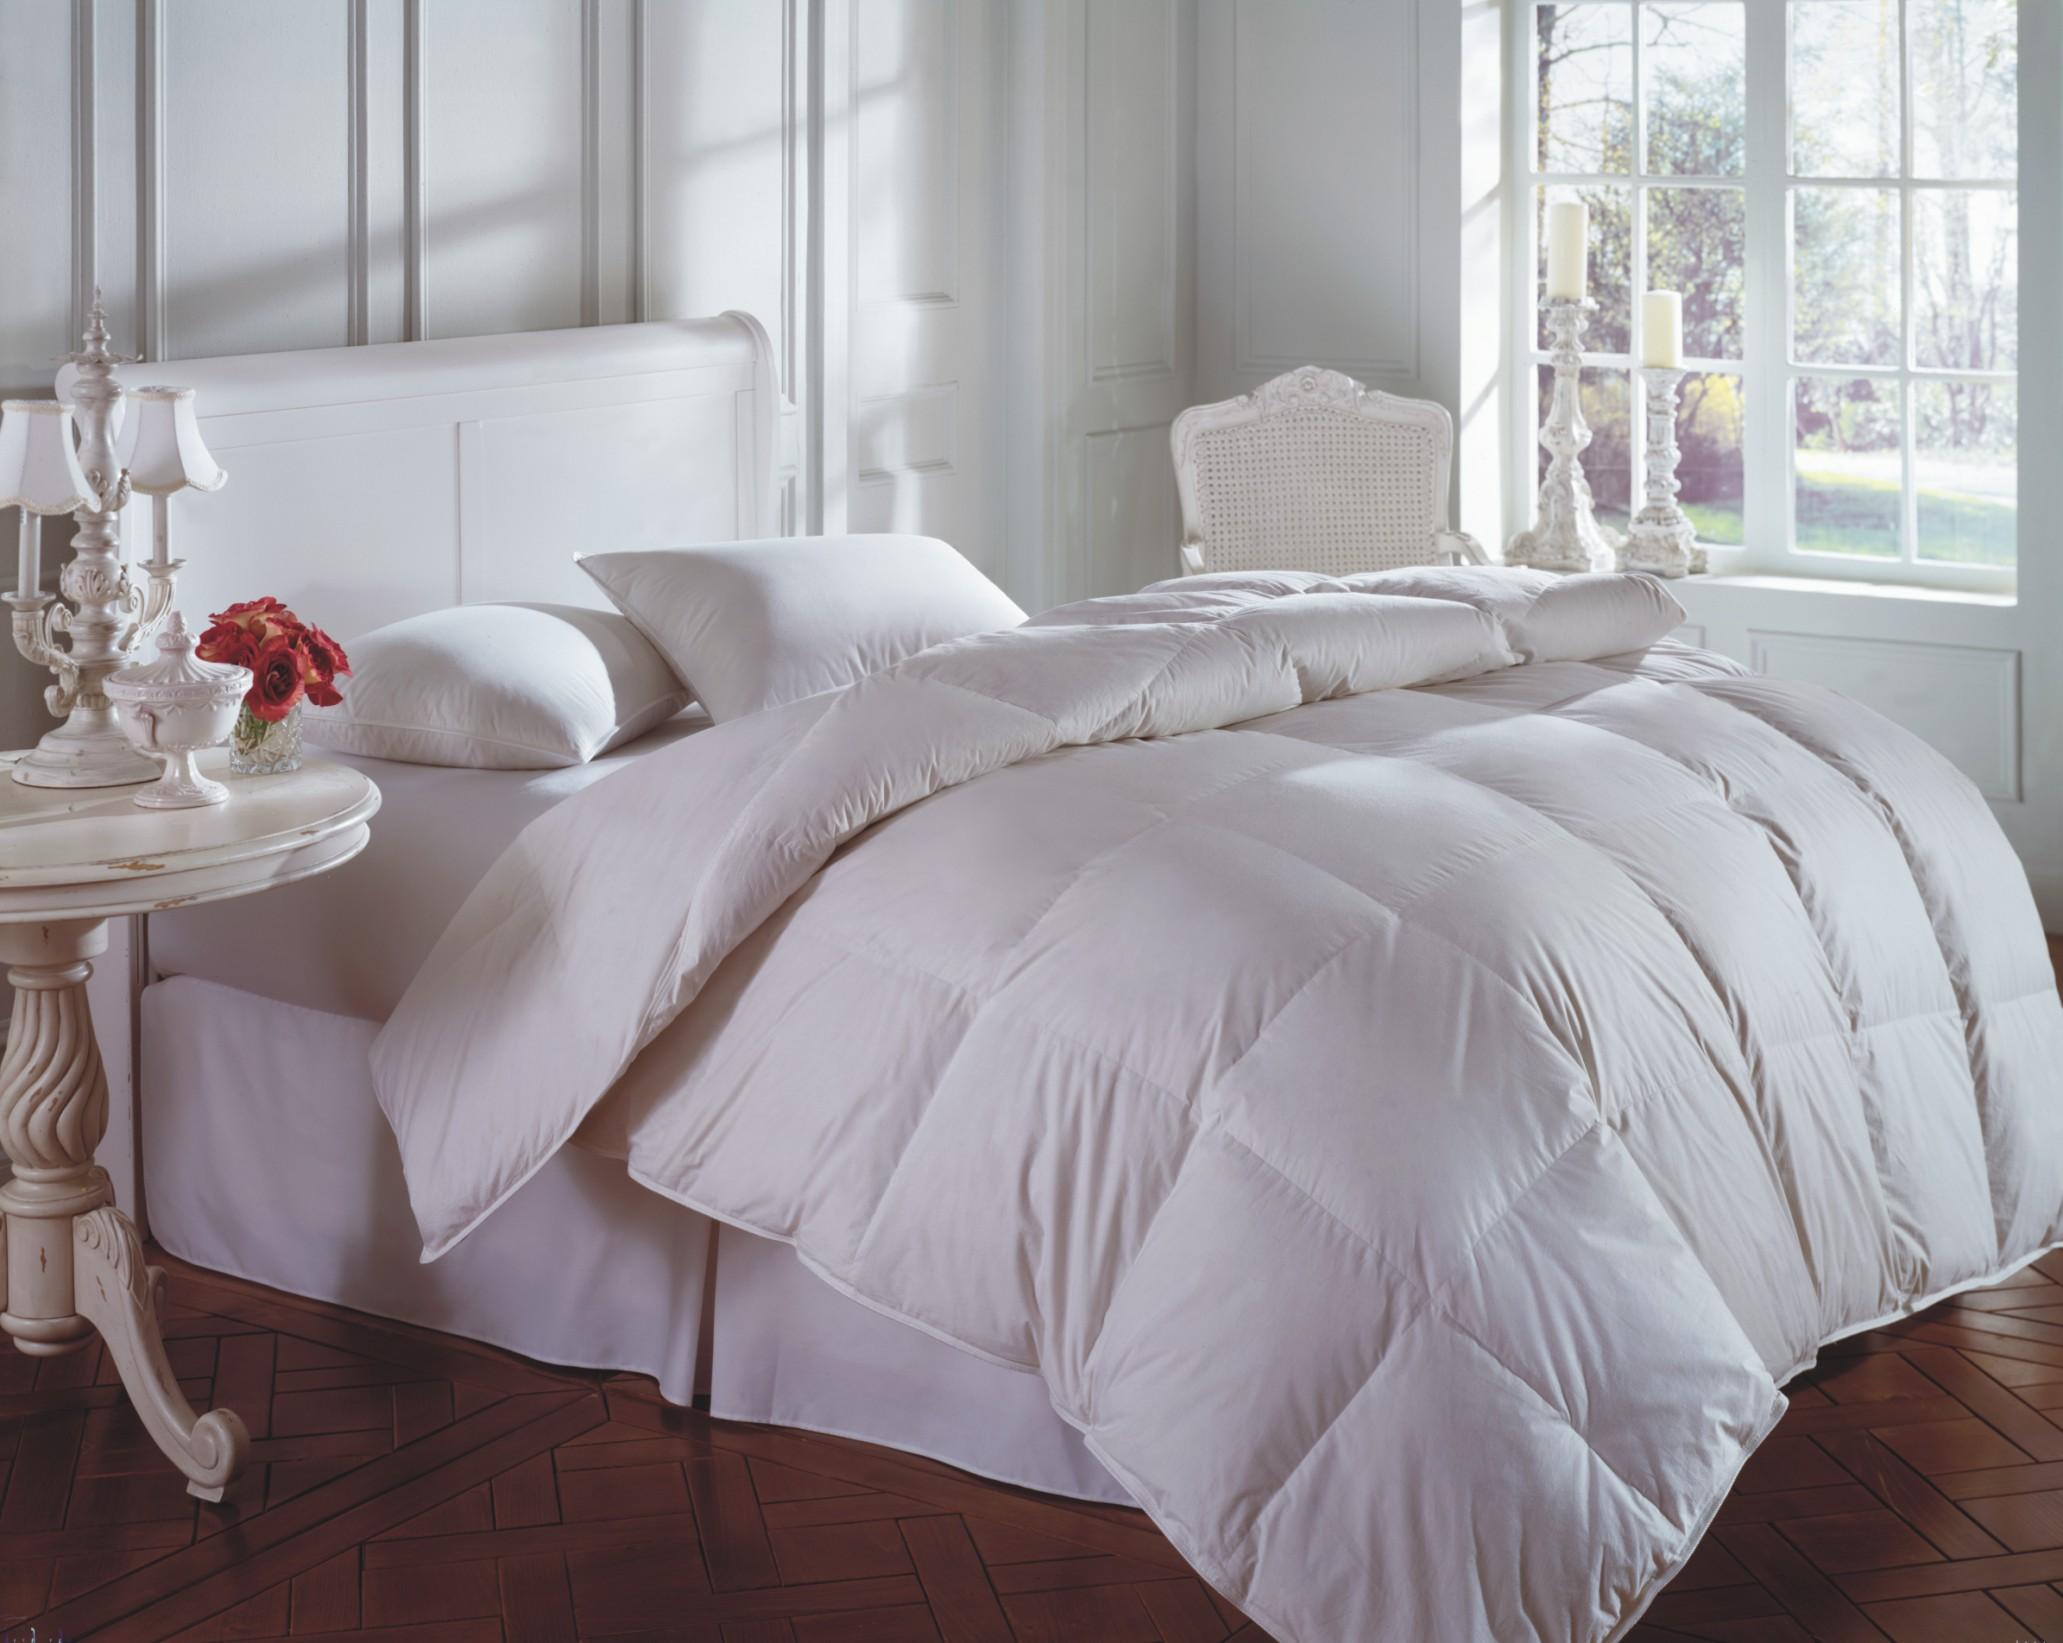 Downright Cascada Summit Comforters Full Comforter 23 Oz Fill Wt